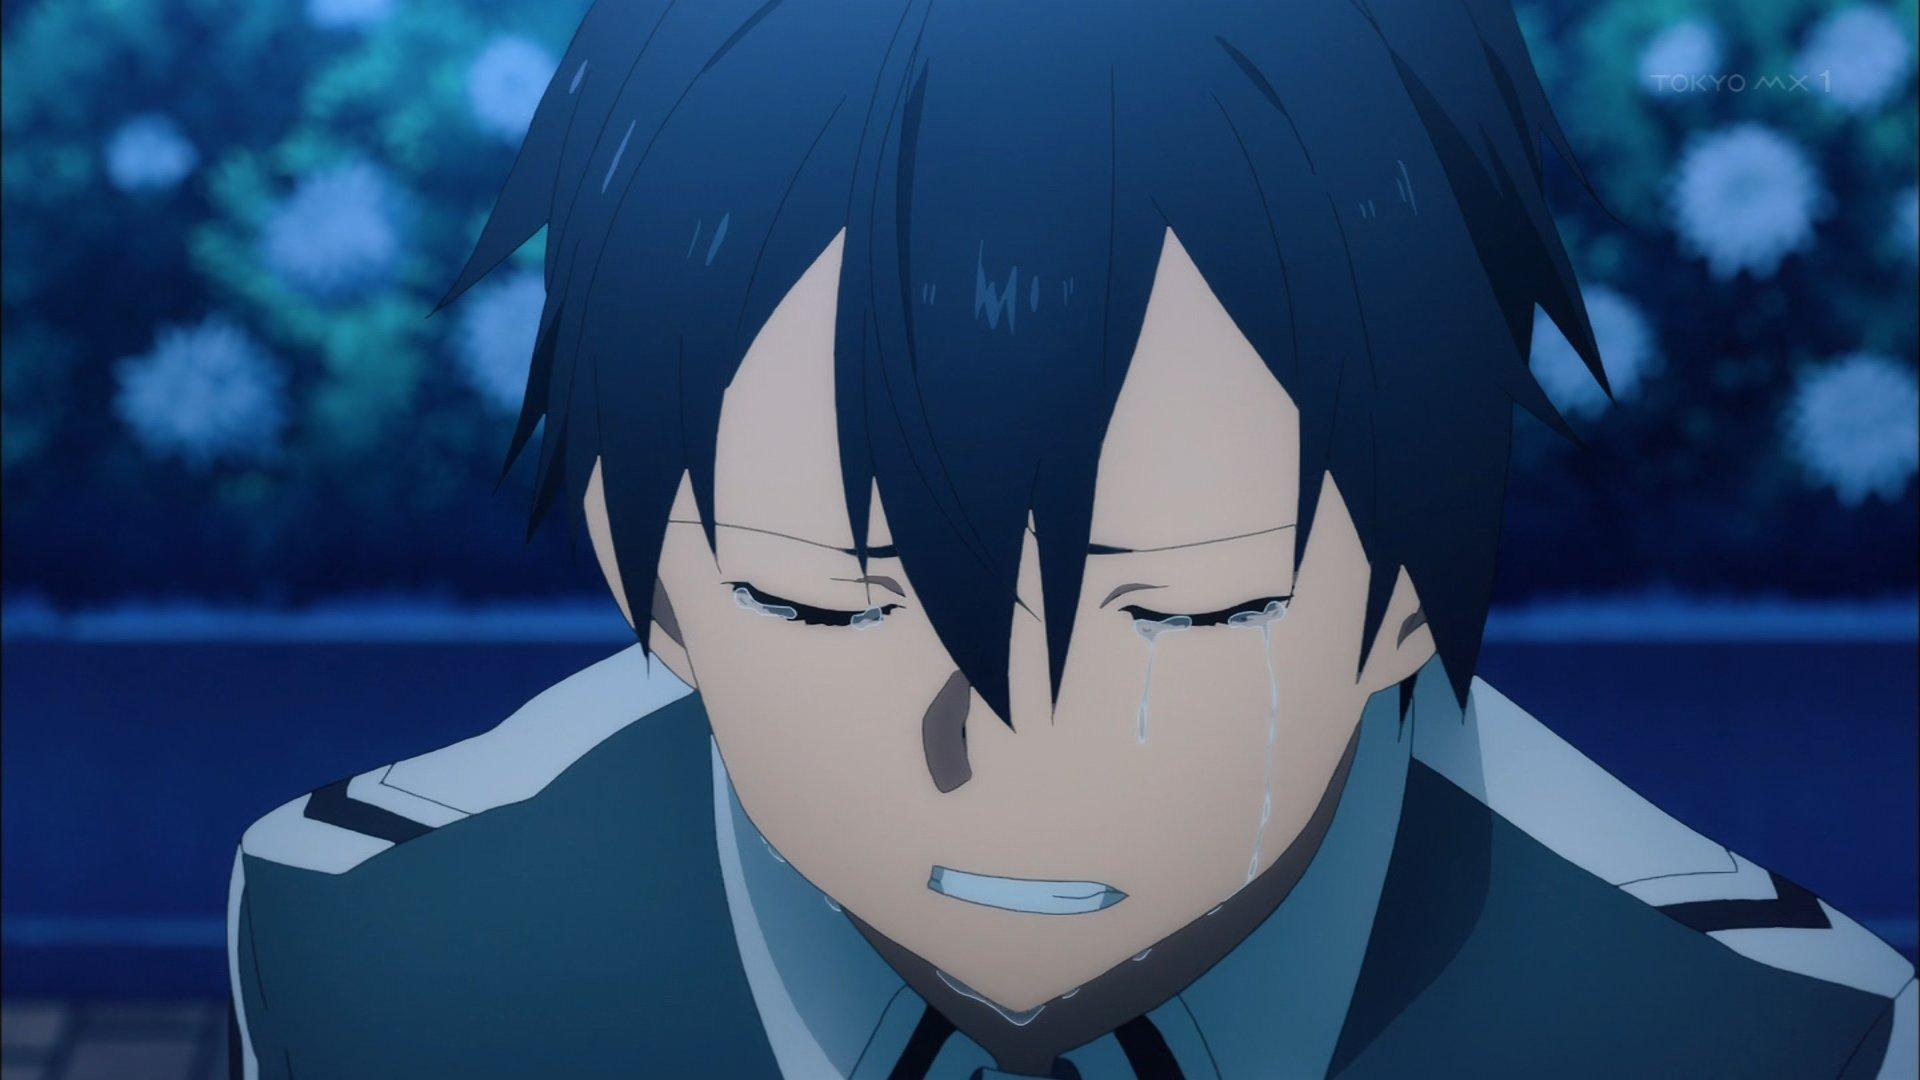 #SAO #sao_anime キリトの泣き顔 https://t.co/PAAdgMmEZi